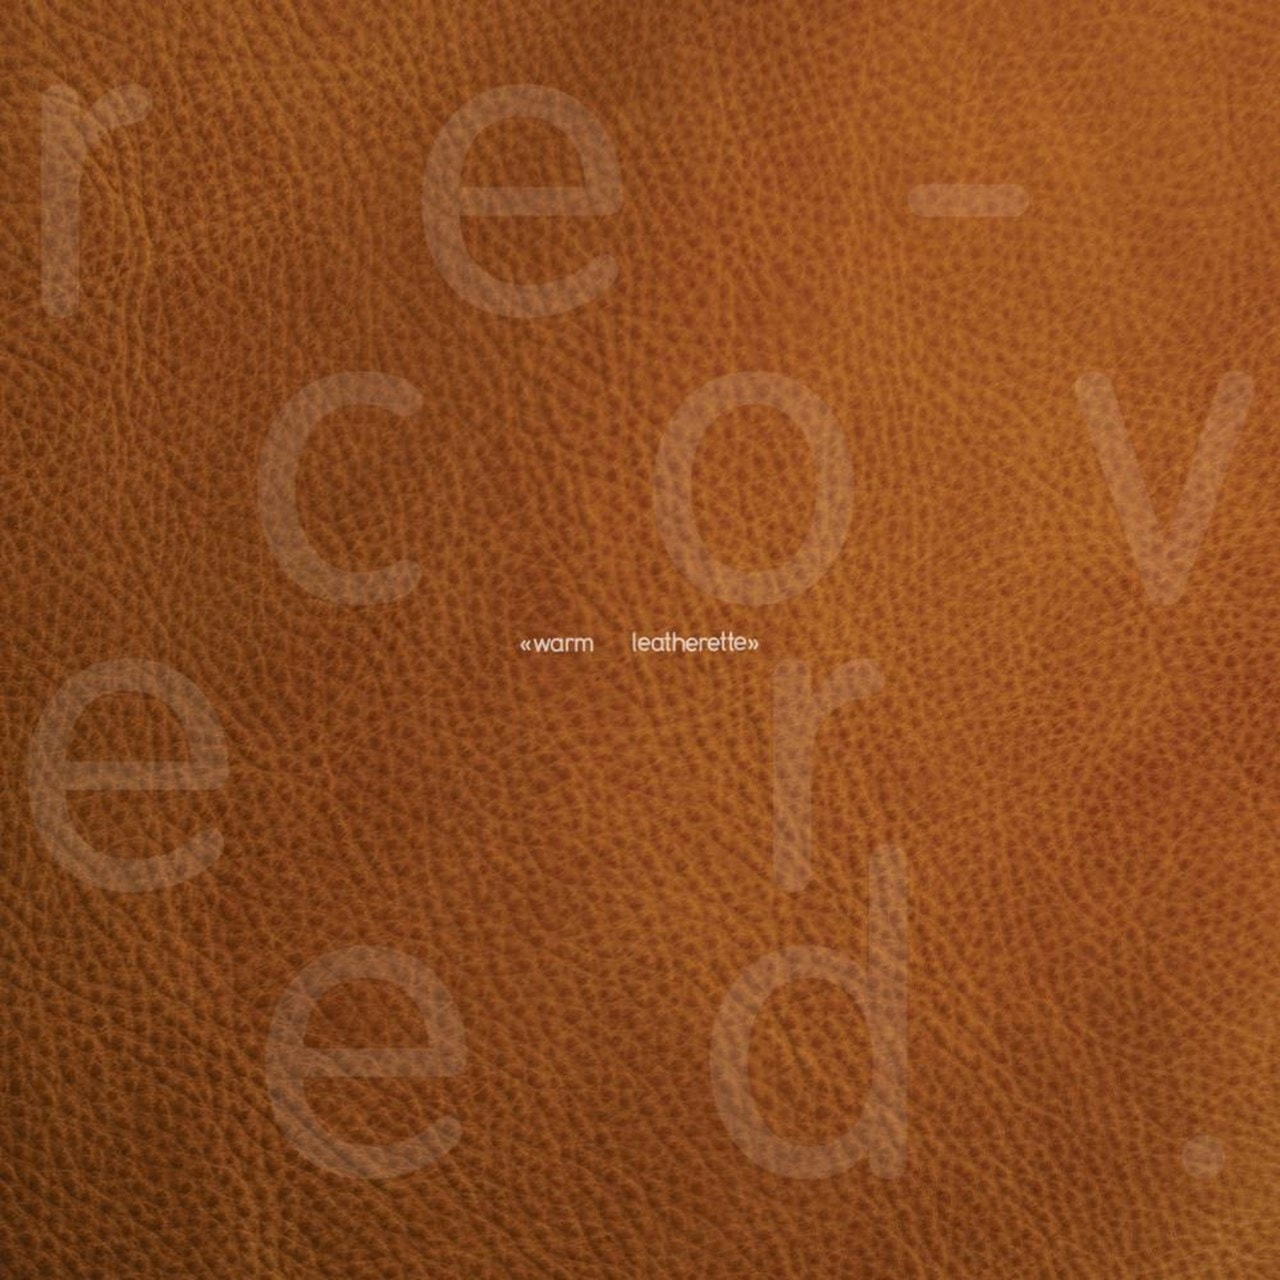 Warm Leatherette Re-covered - Tan Leatherette Vinyl (LRS20) - 1